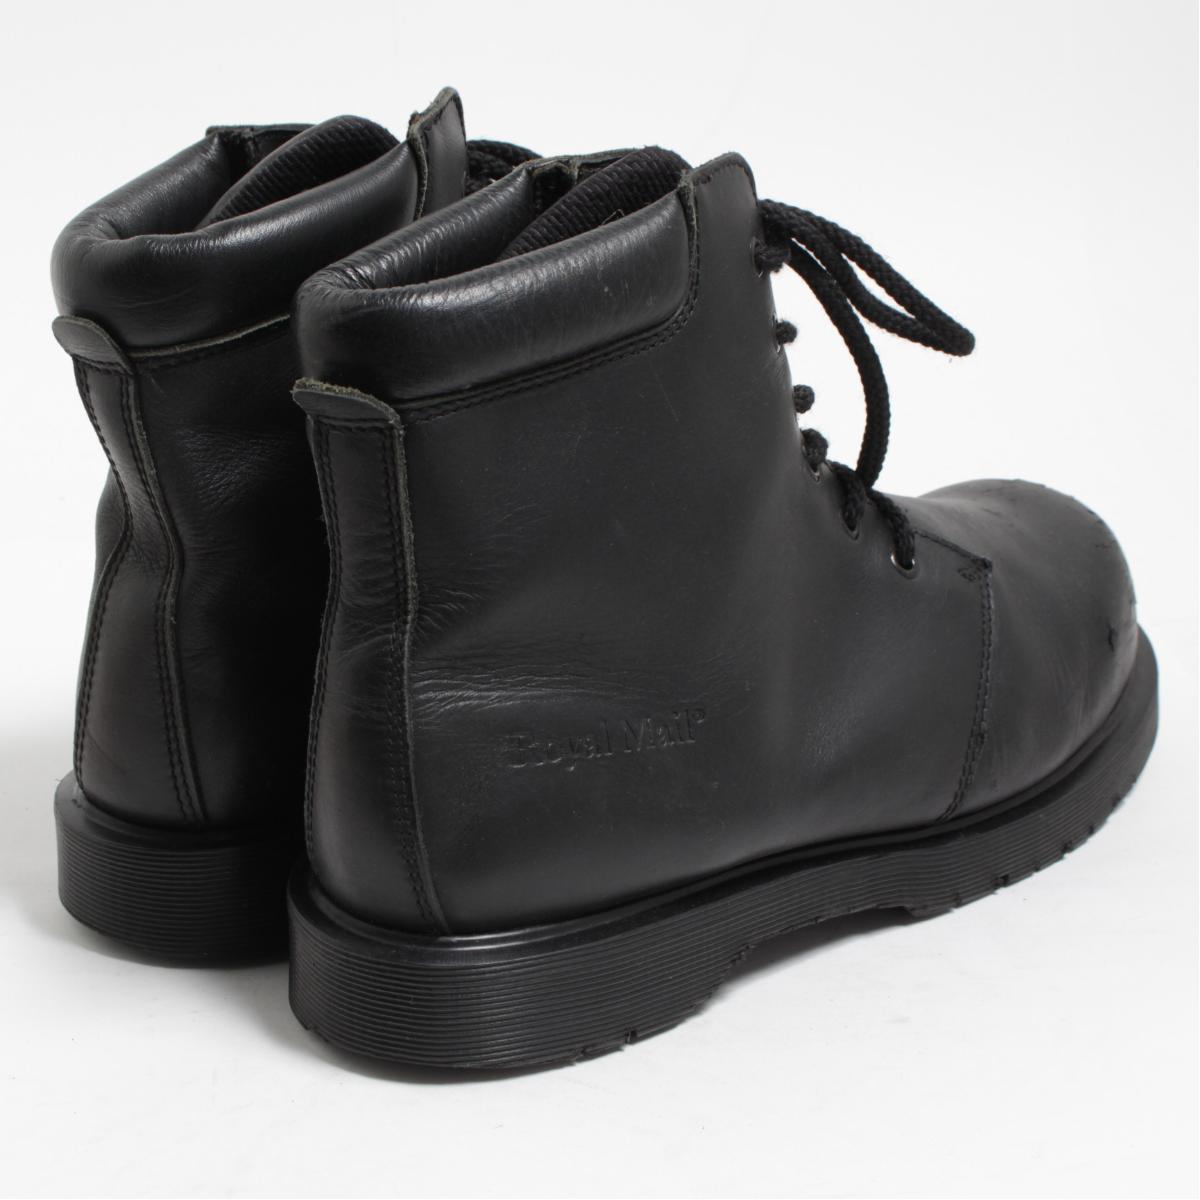 Men 29.0cm /bom5199 made in the doctor Martin Dr.Martens Royal Mail steel toe 6 hall boots U.K.